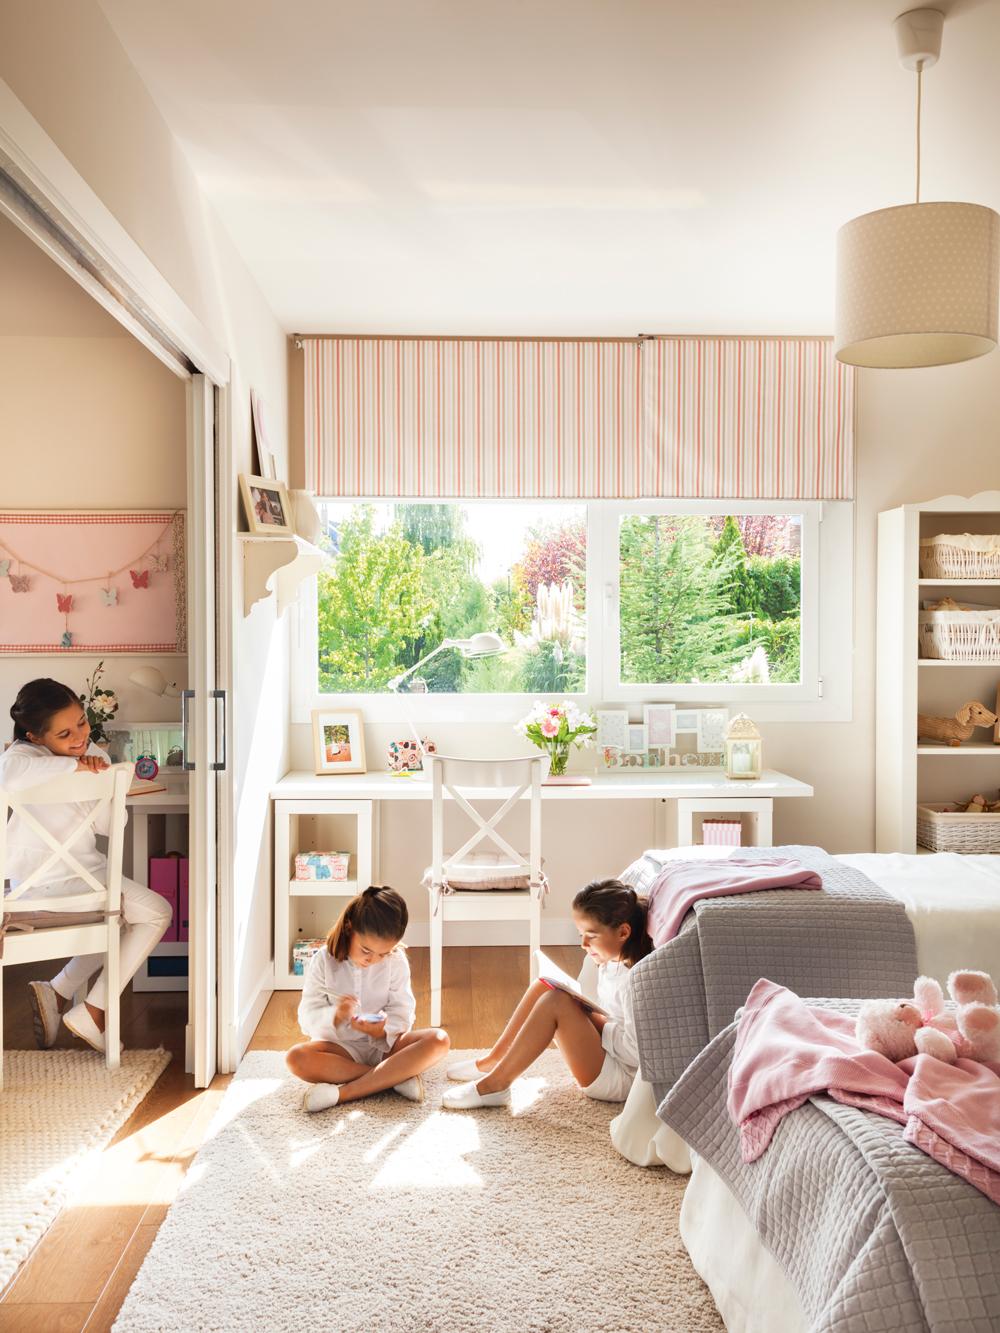 10 ideas para decorar la habitaci n infantil perfecta for Habitacion infantil dos camas